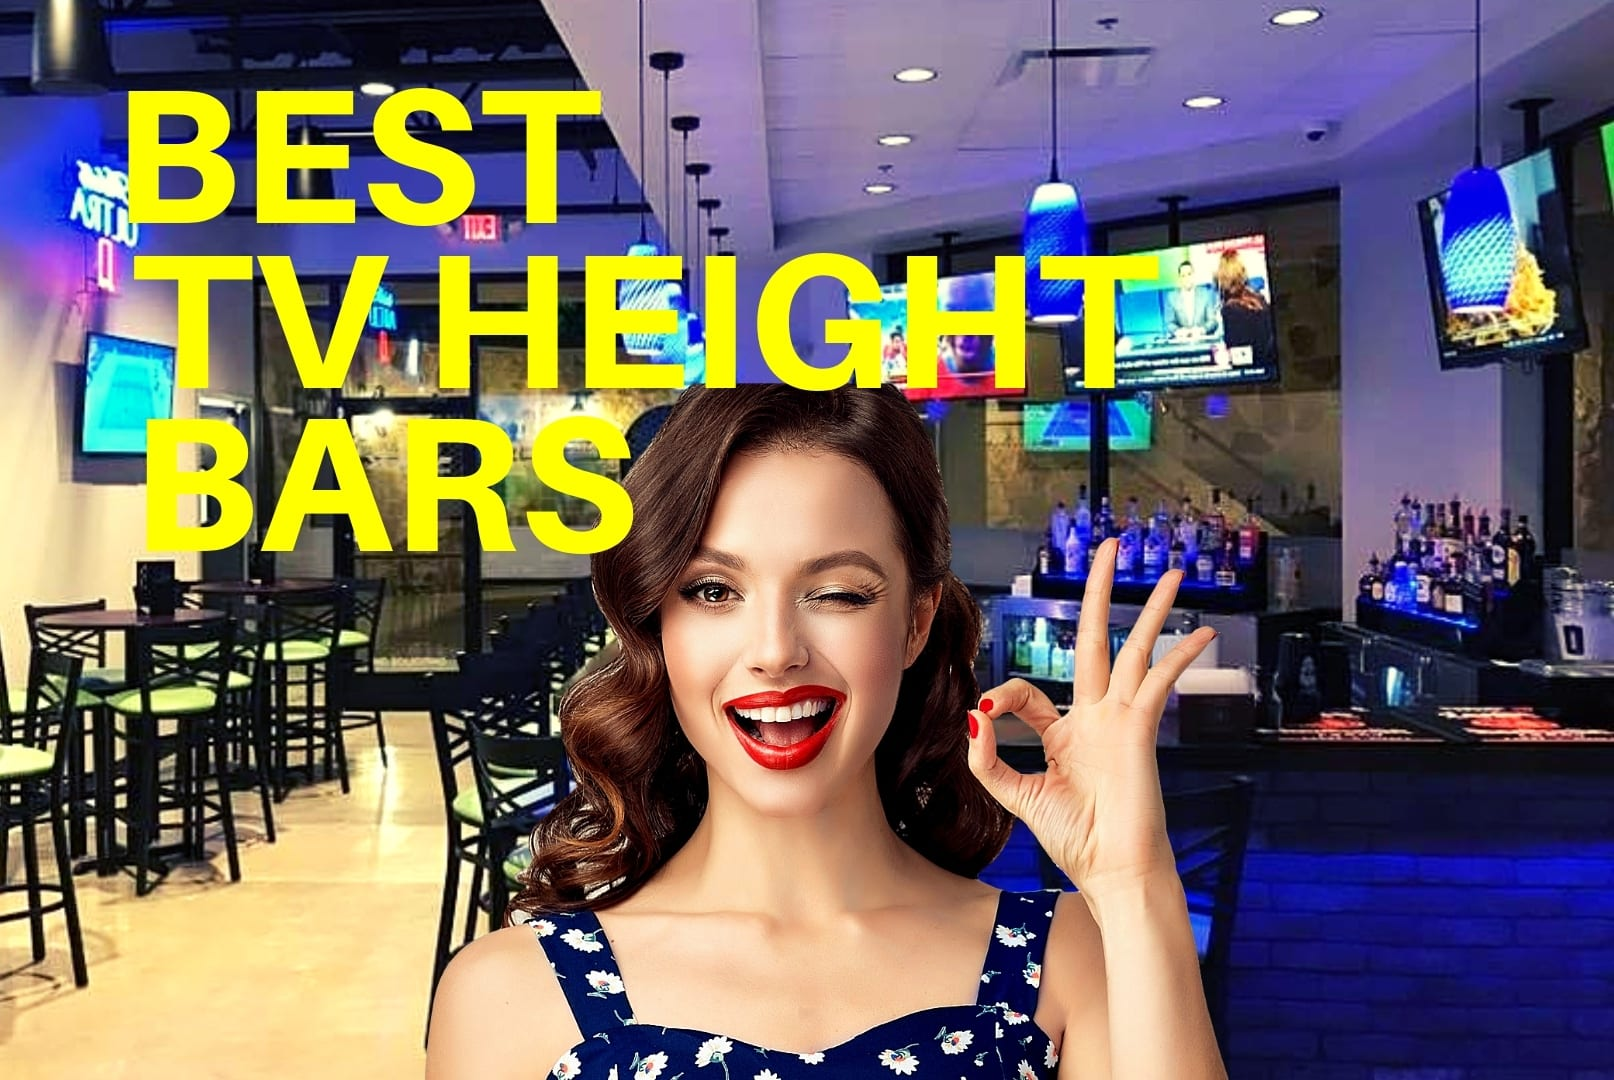 BEST-TV-HEIGHT-FOR-BARS-TN